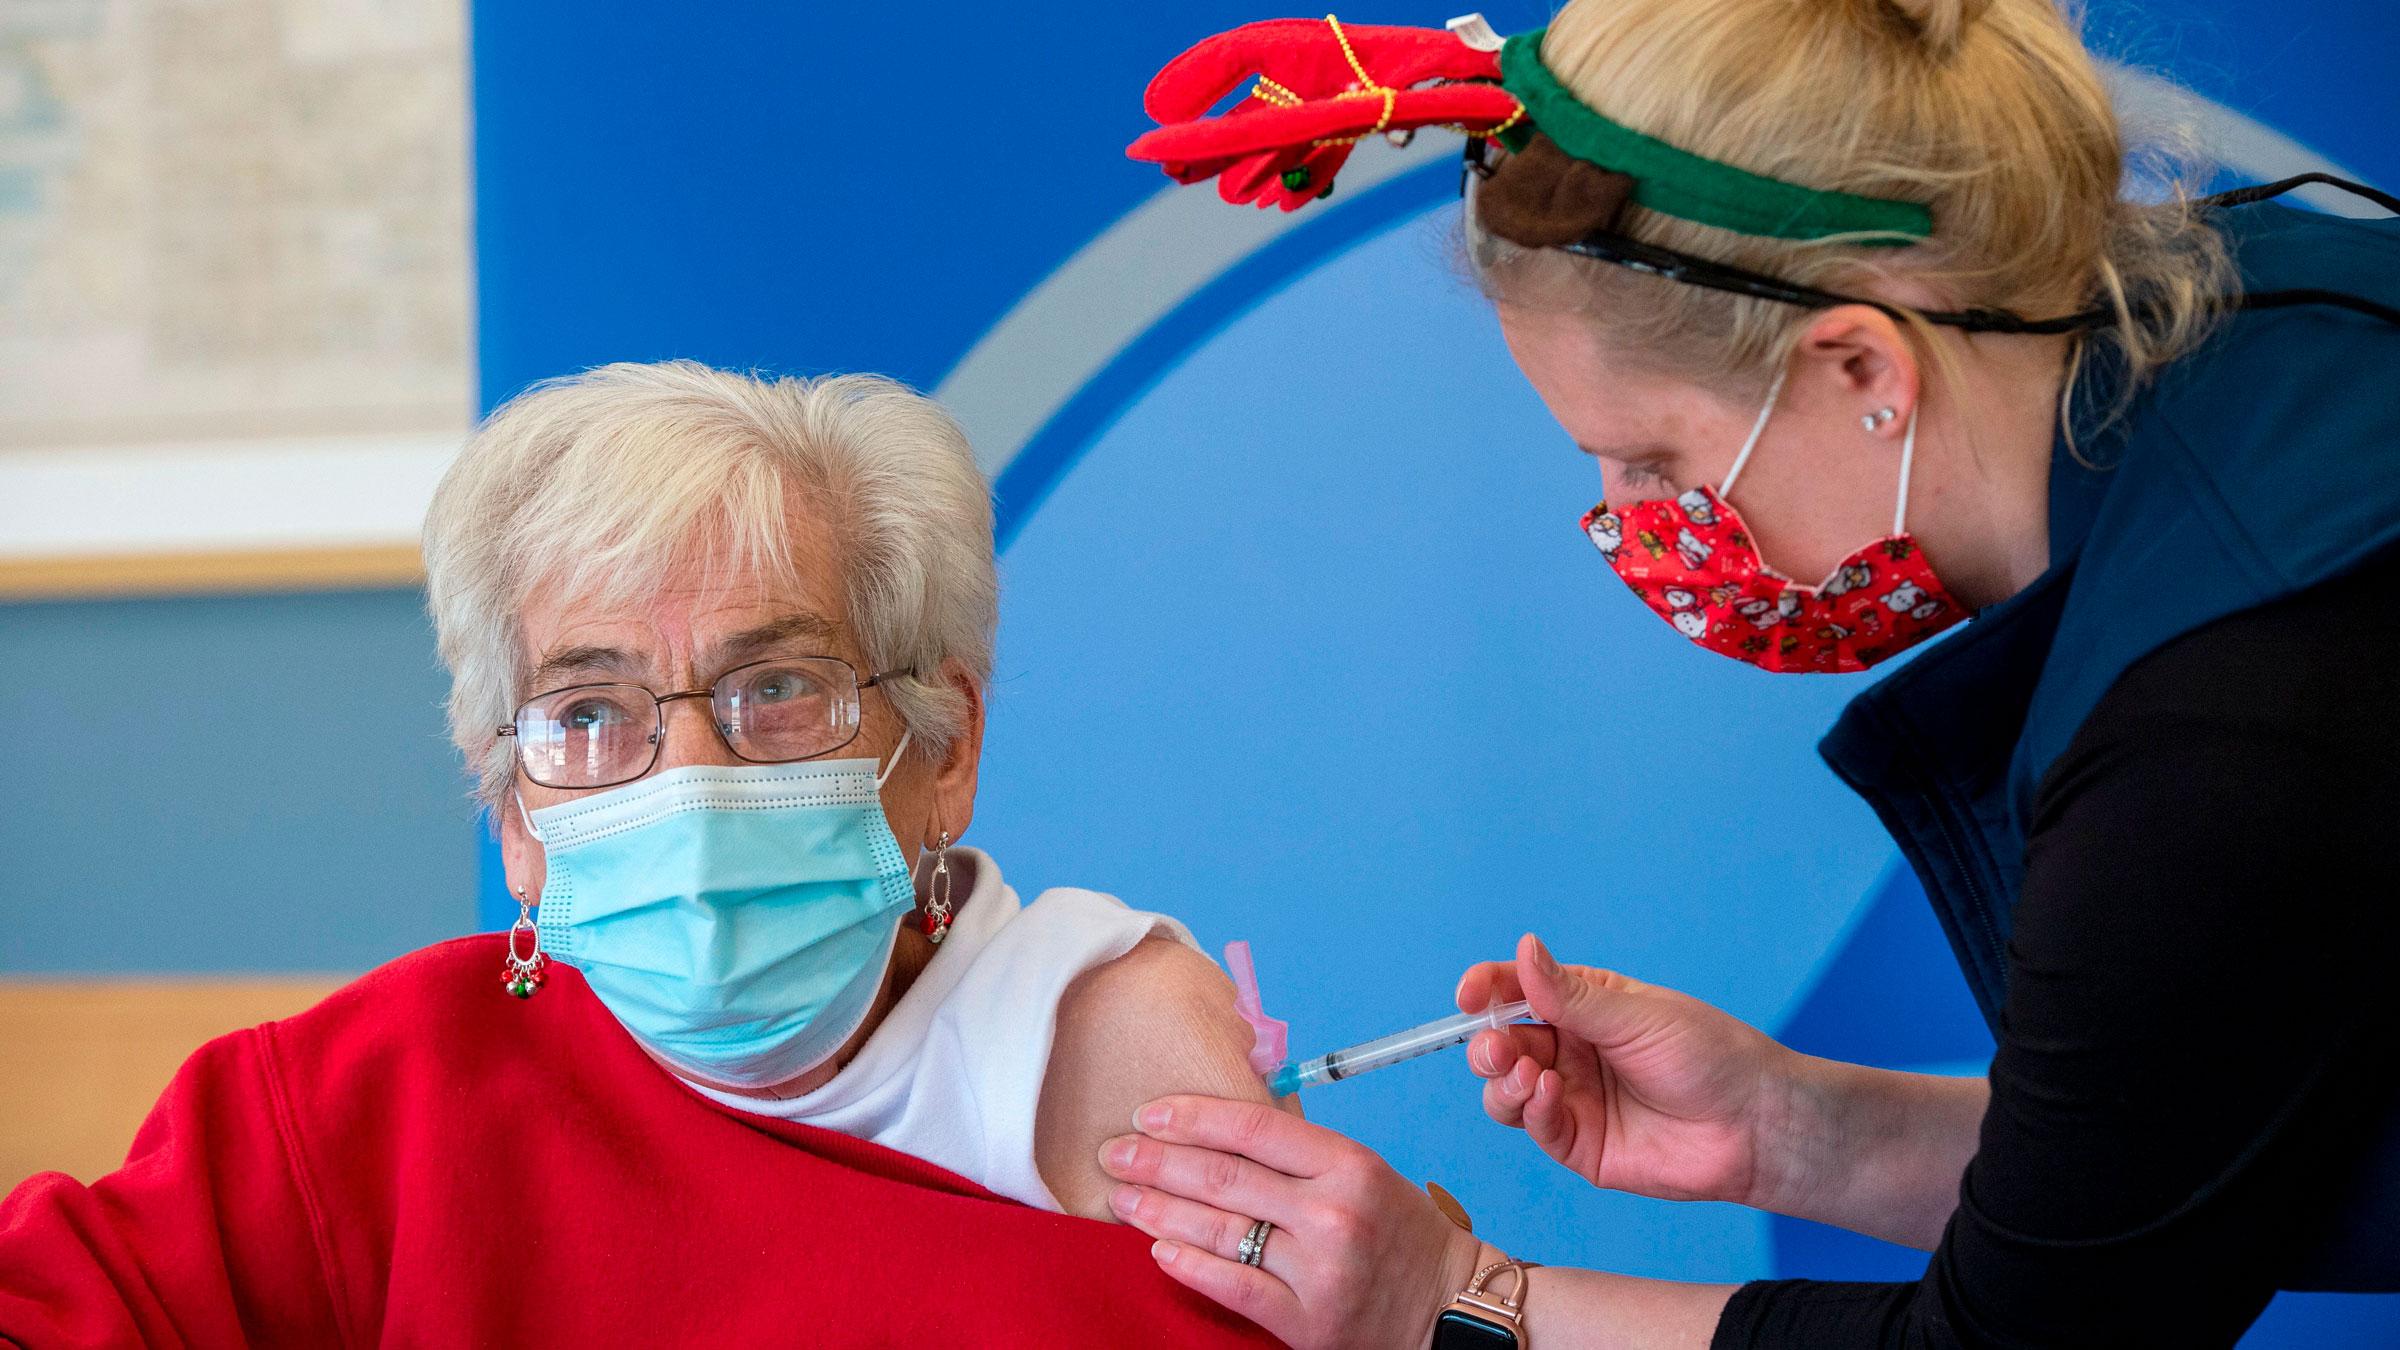 Nurse Courtney Senechal inoculates Phyllis Fischer with a Covid-19 vaccine in Boston.